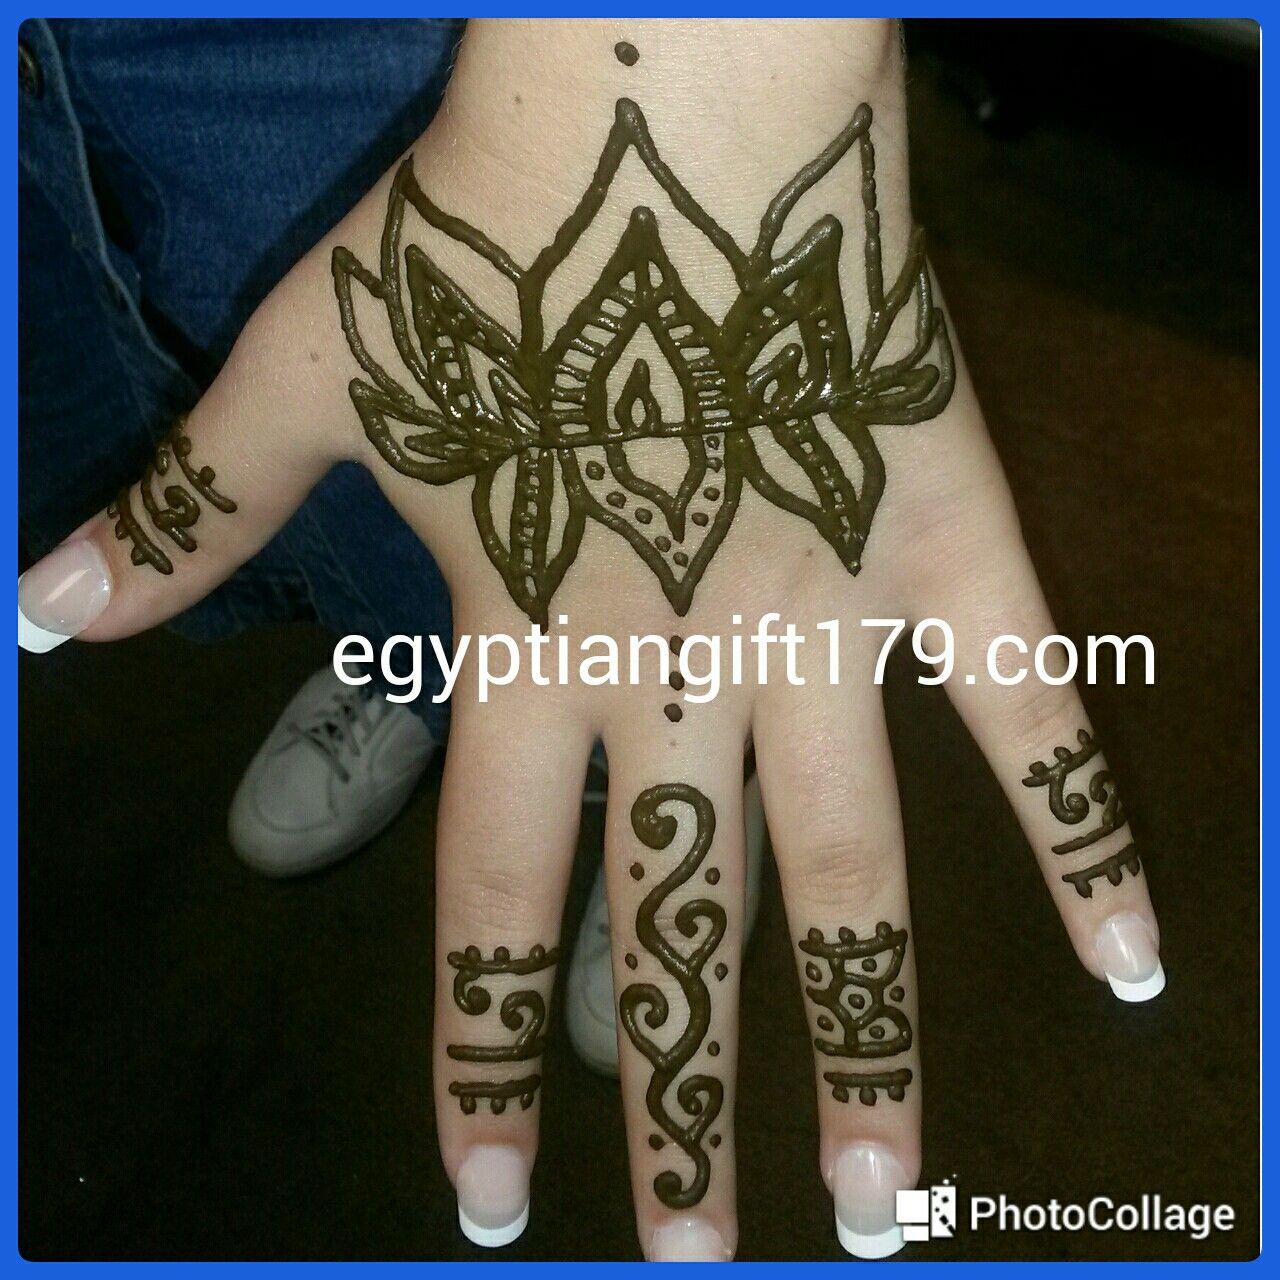 Egyptian gift corner henna shop tattoos henna